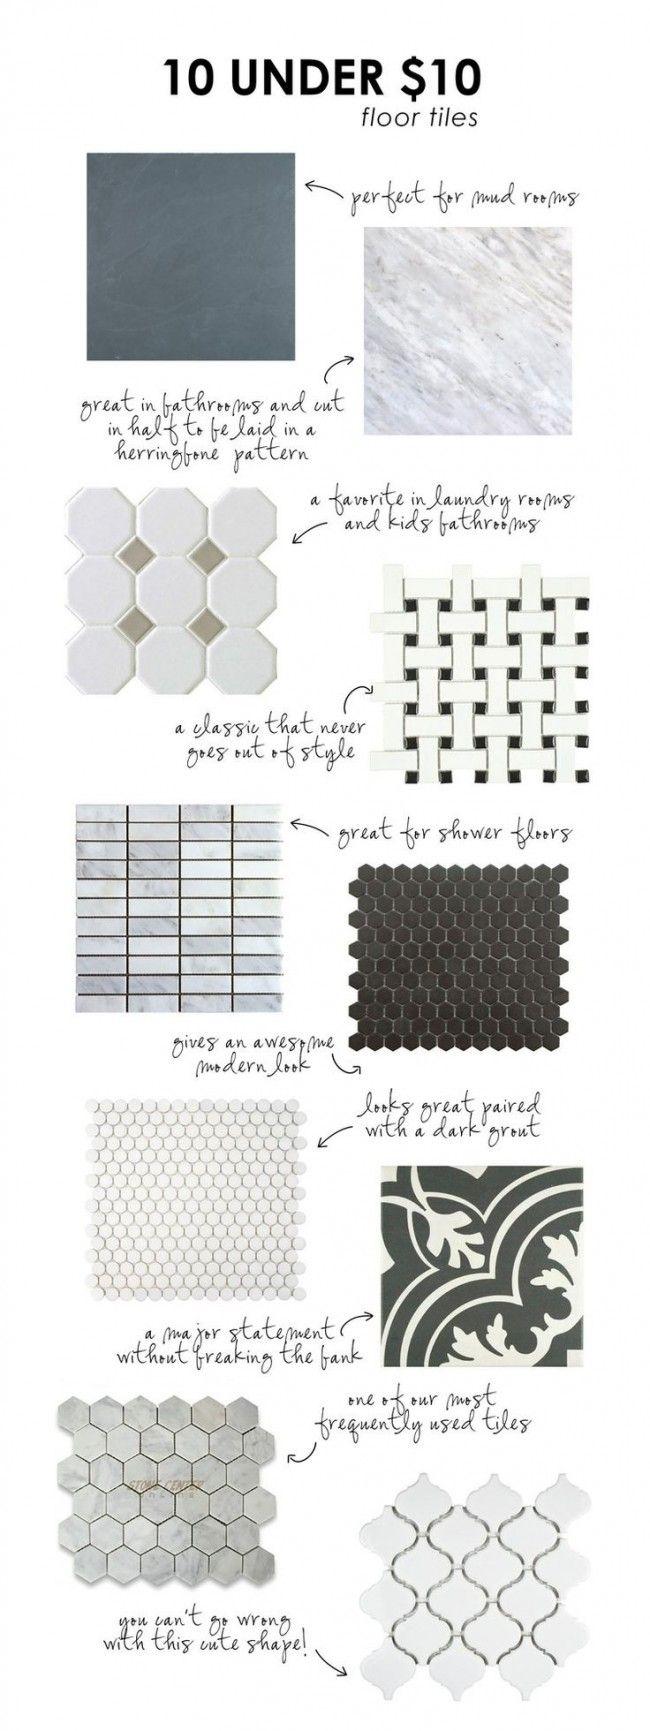 10 tiles under $10